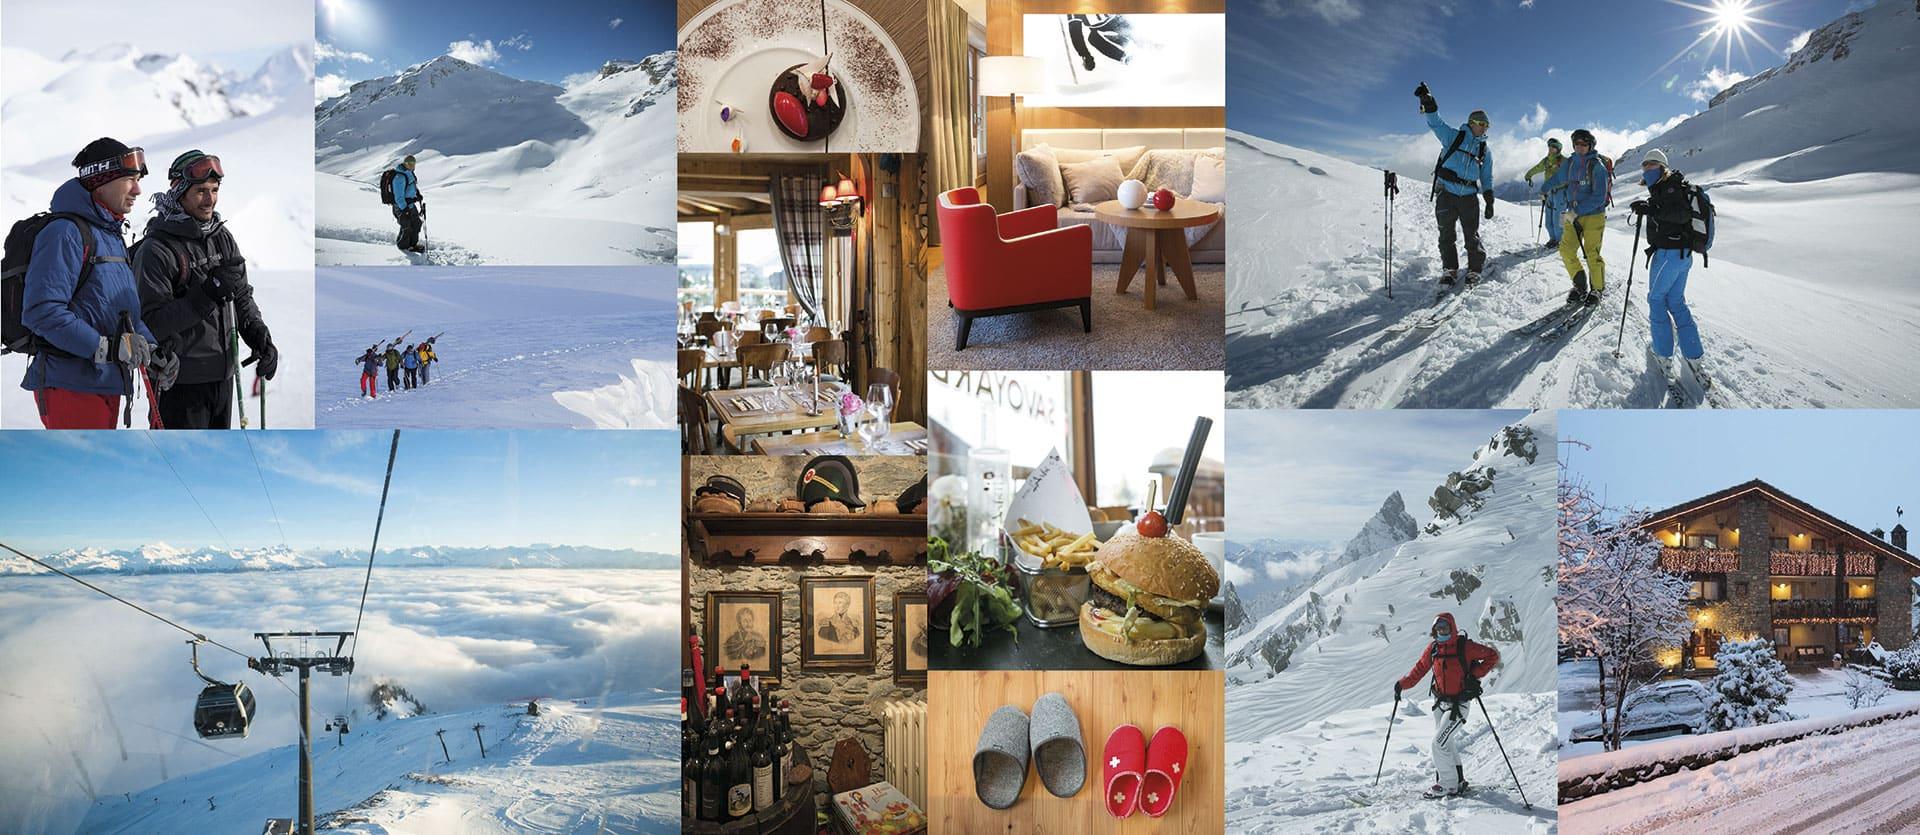 Alpine Skiing Collage